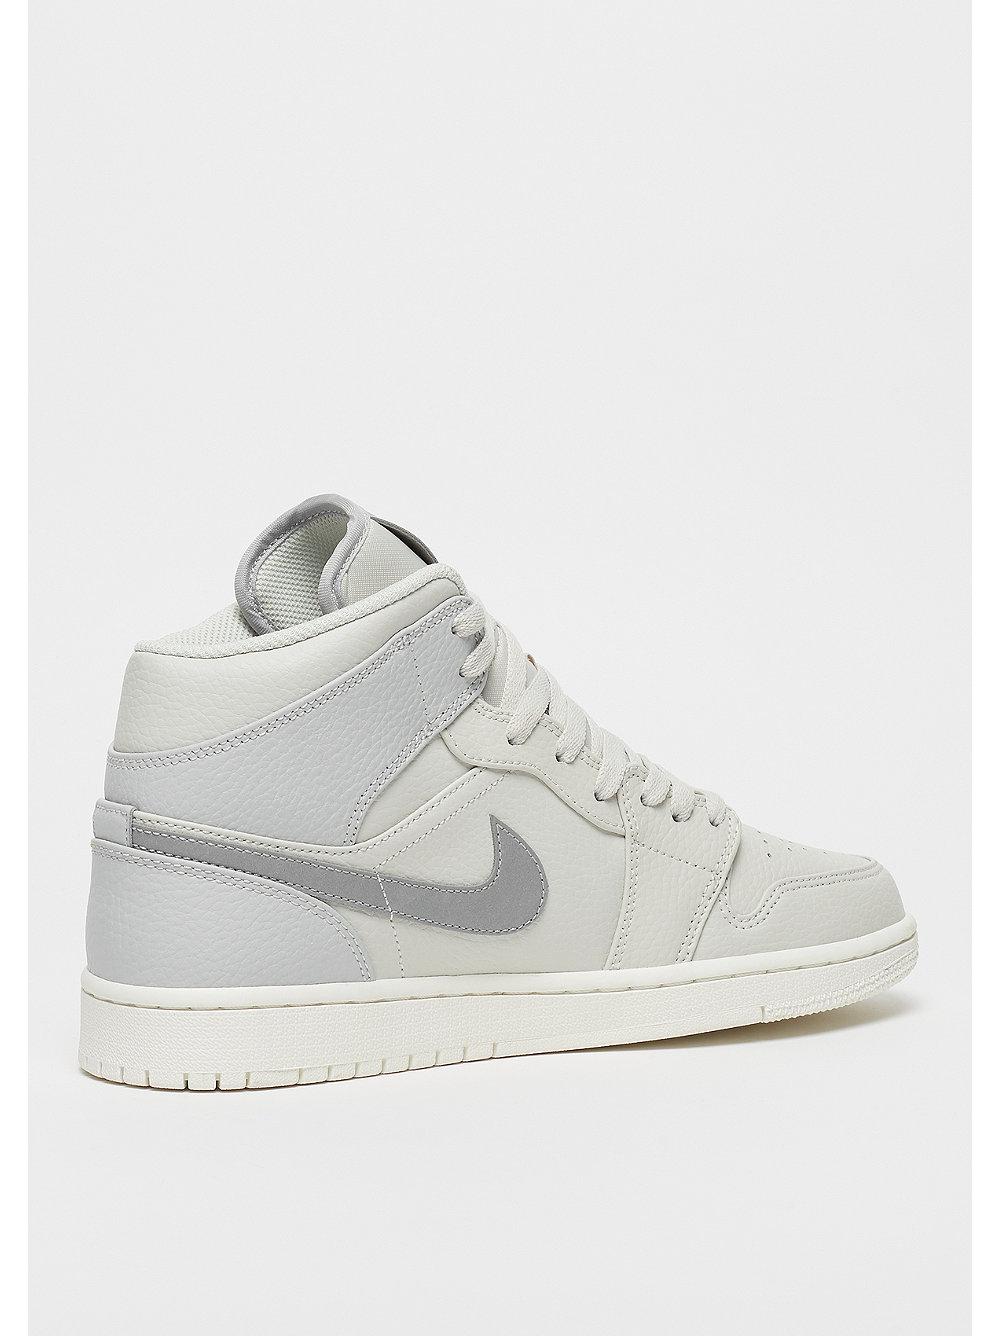 new product b2d1e 08f27 Jordan Air Jordan 1 mid white Sneaker bei SNIPES